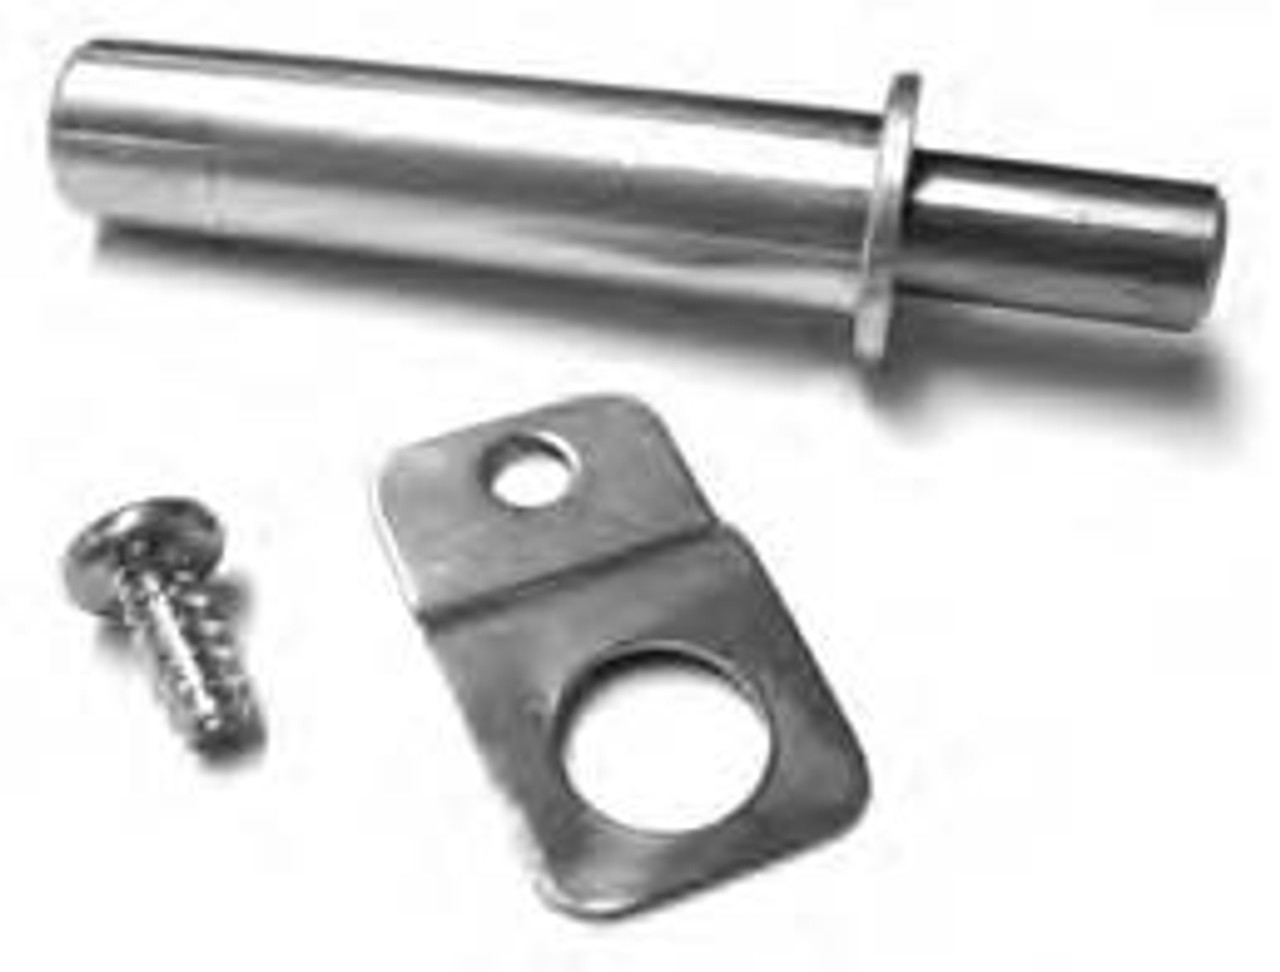 02-16015-0001 Displayrite Hinge Pin Assembly